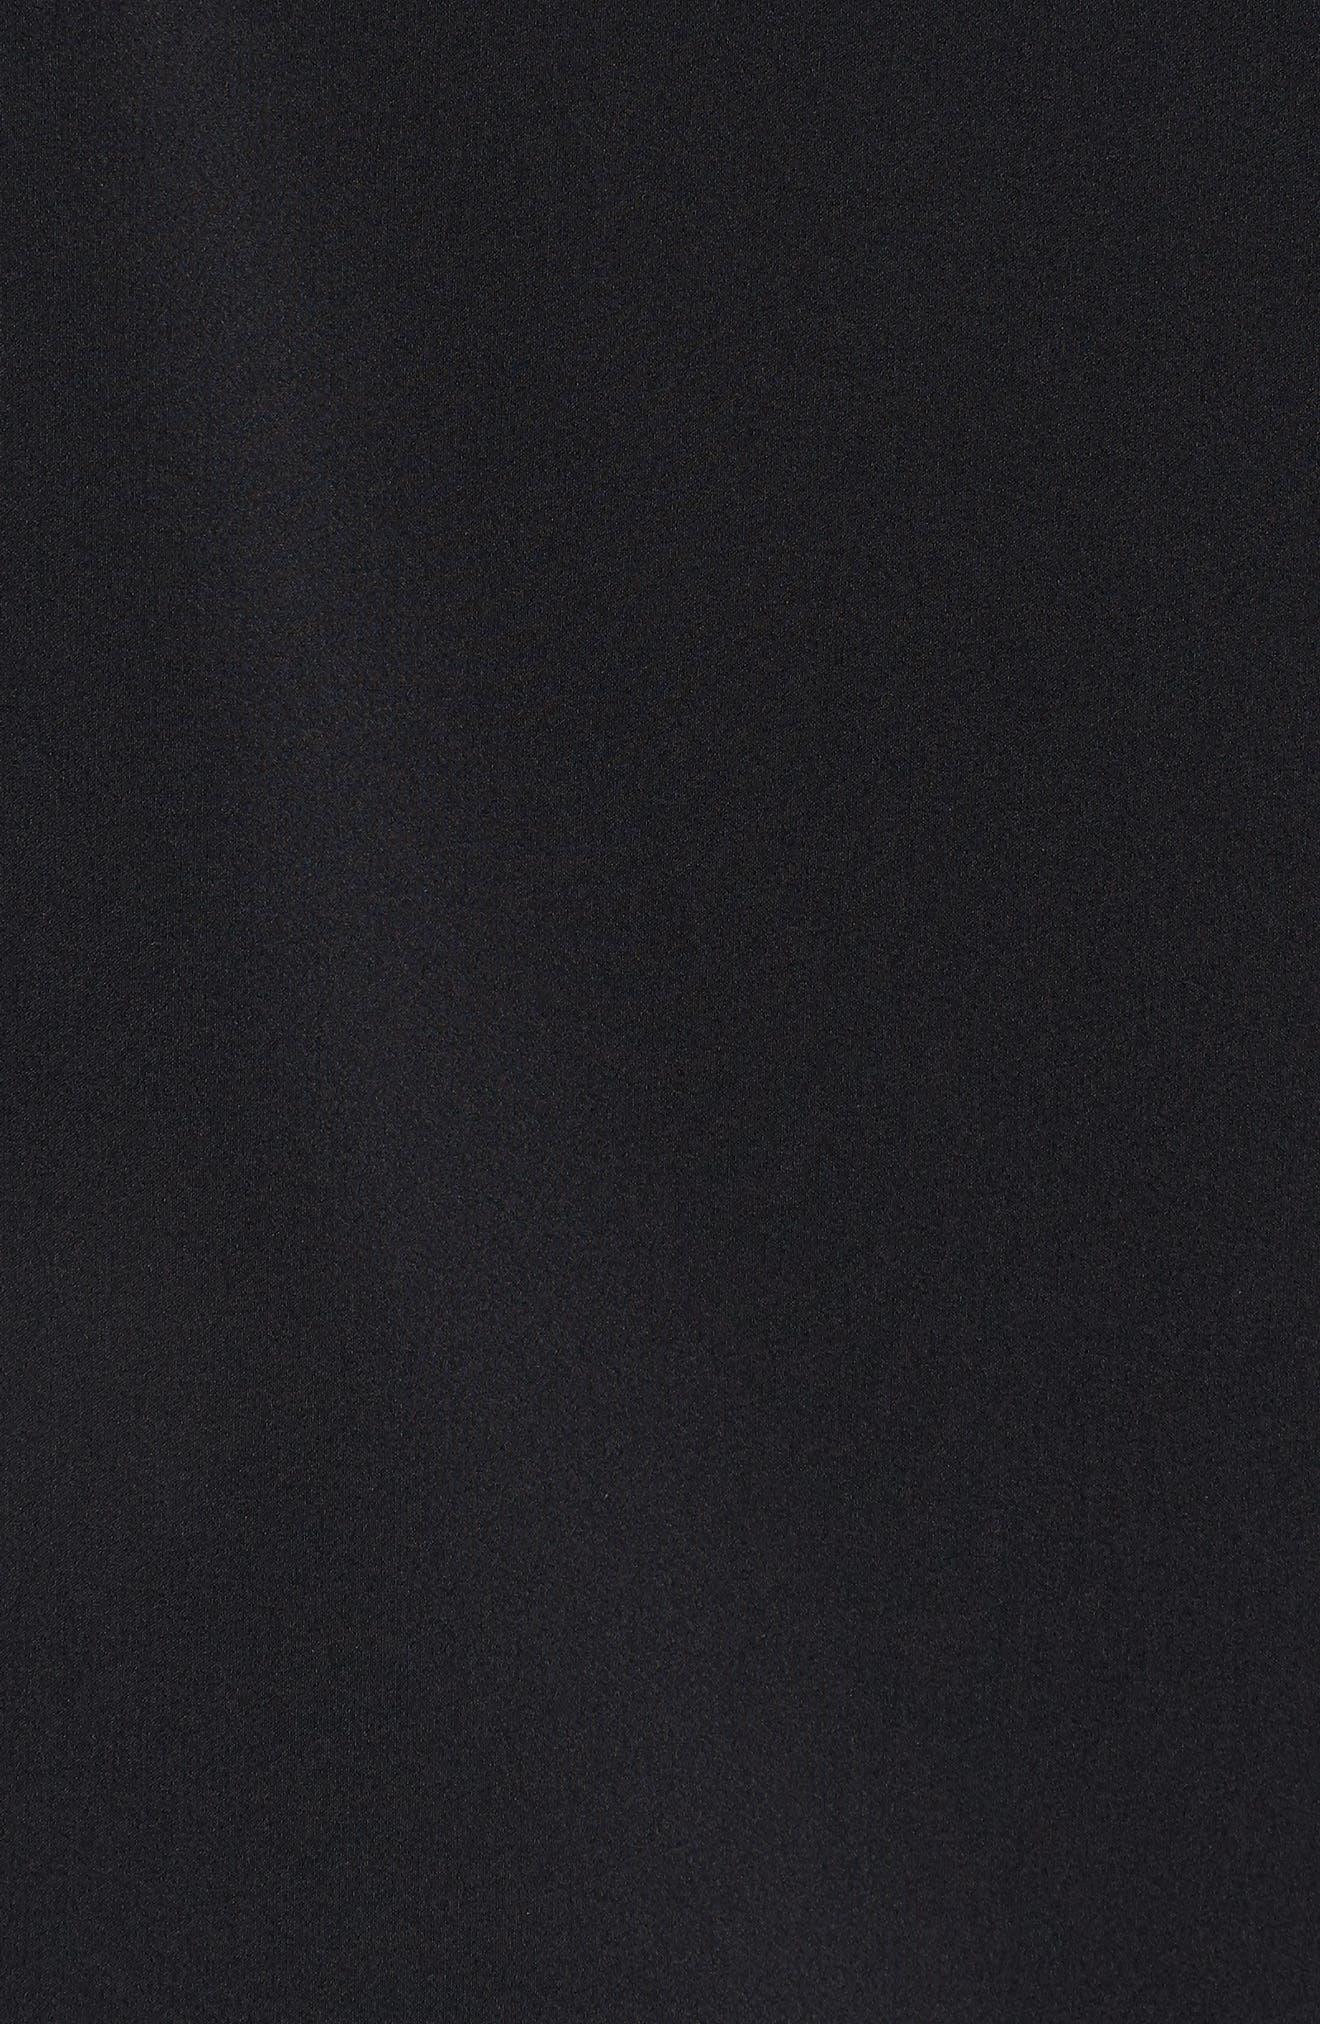 THE NORTH FACE, Tekno Zip Jacket, Alternate thumbnail 7, color, 001